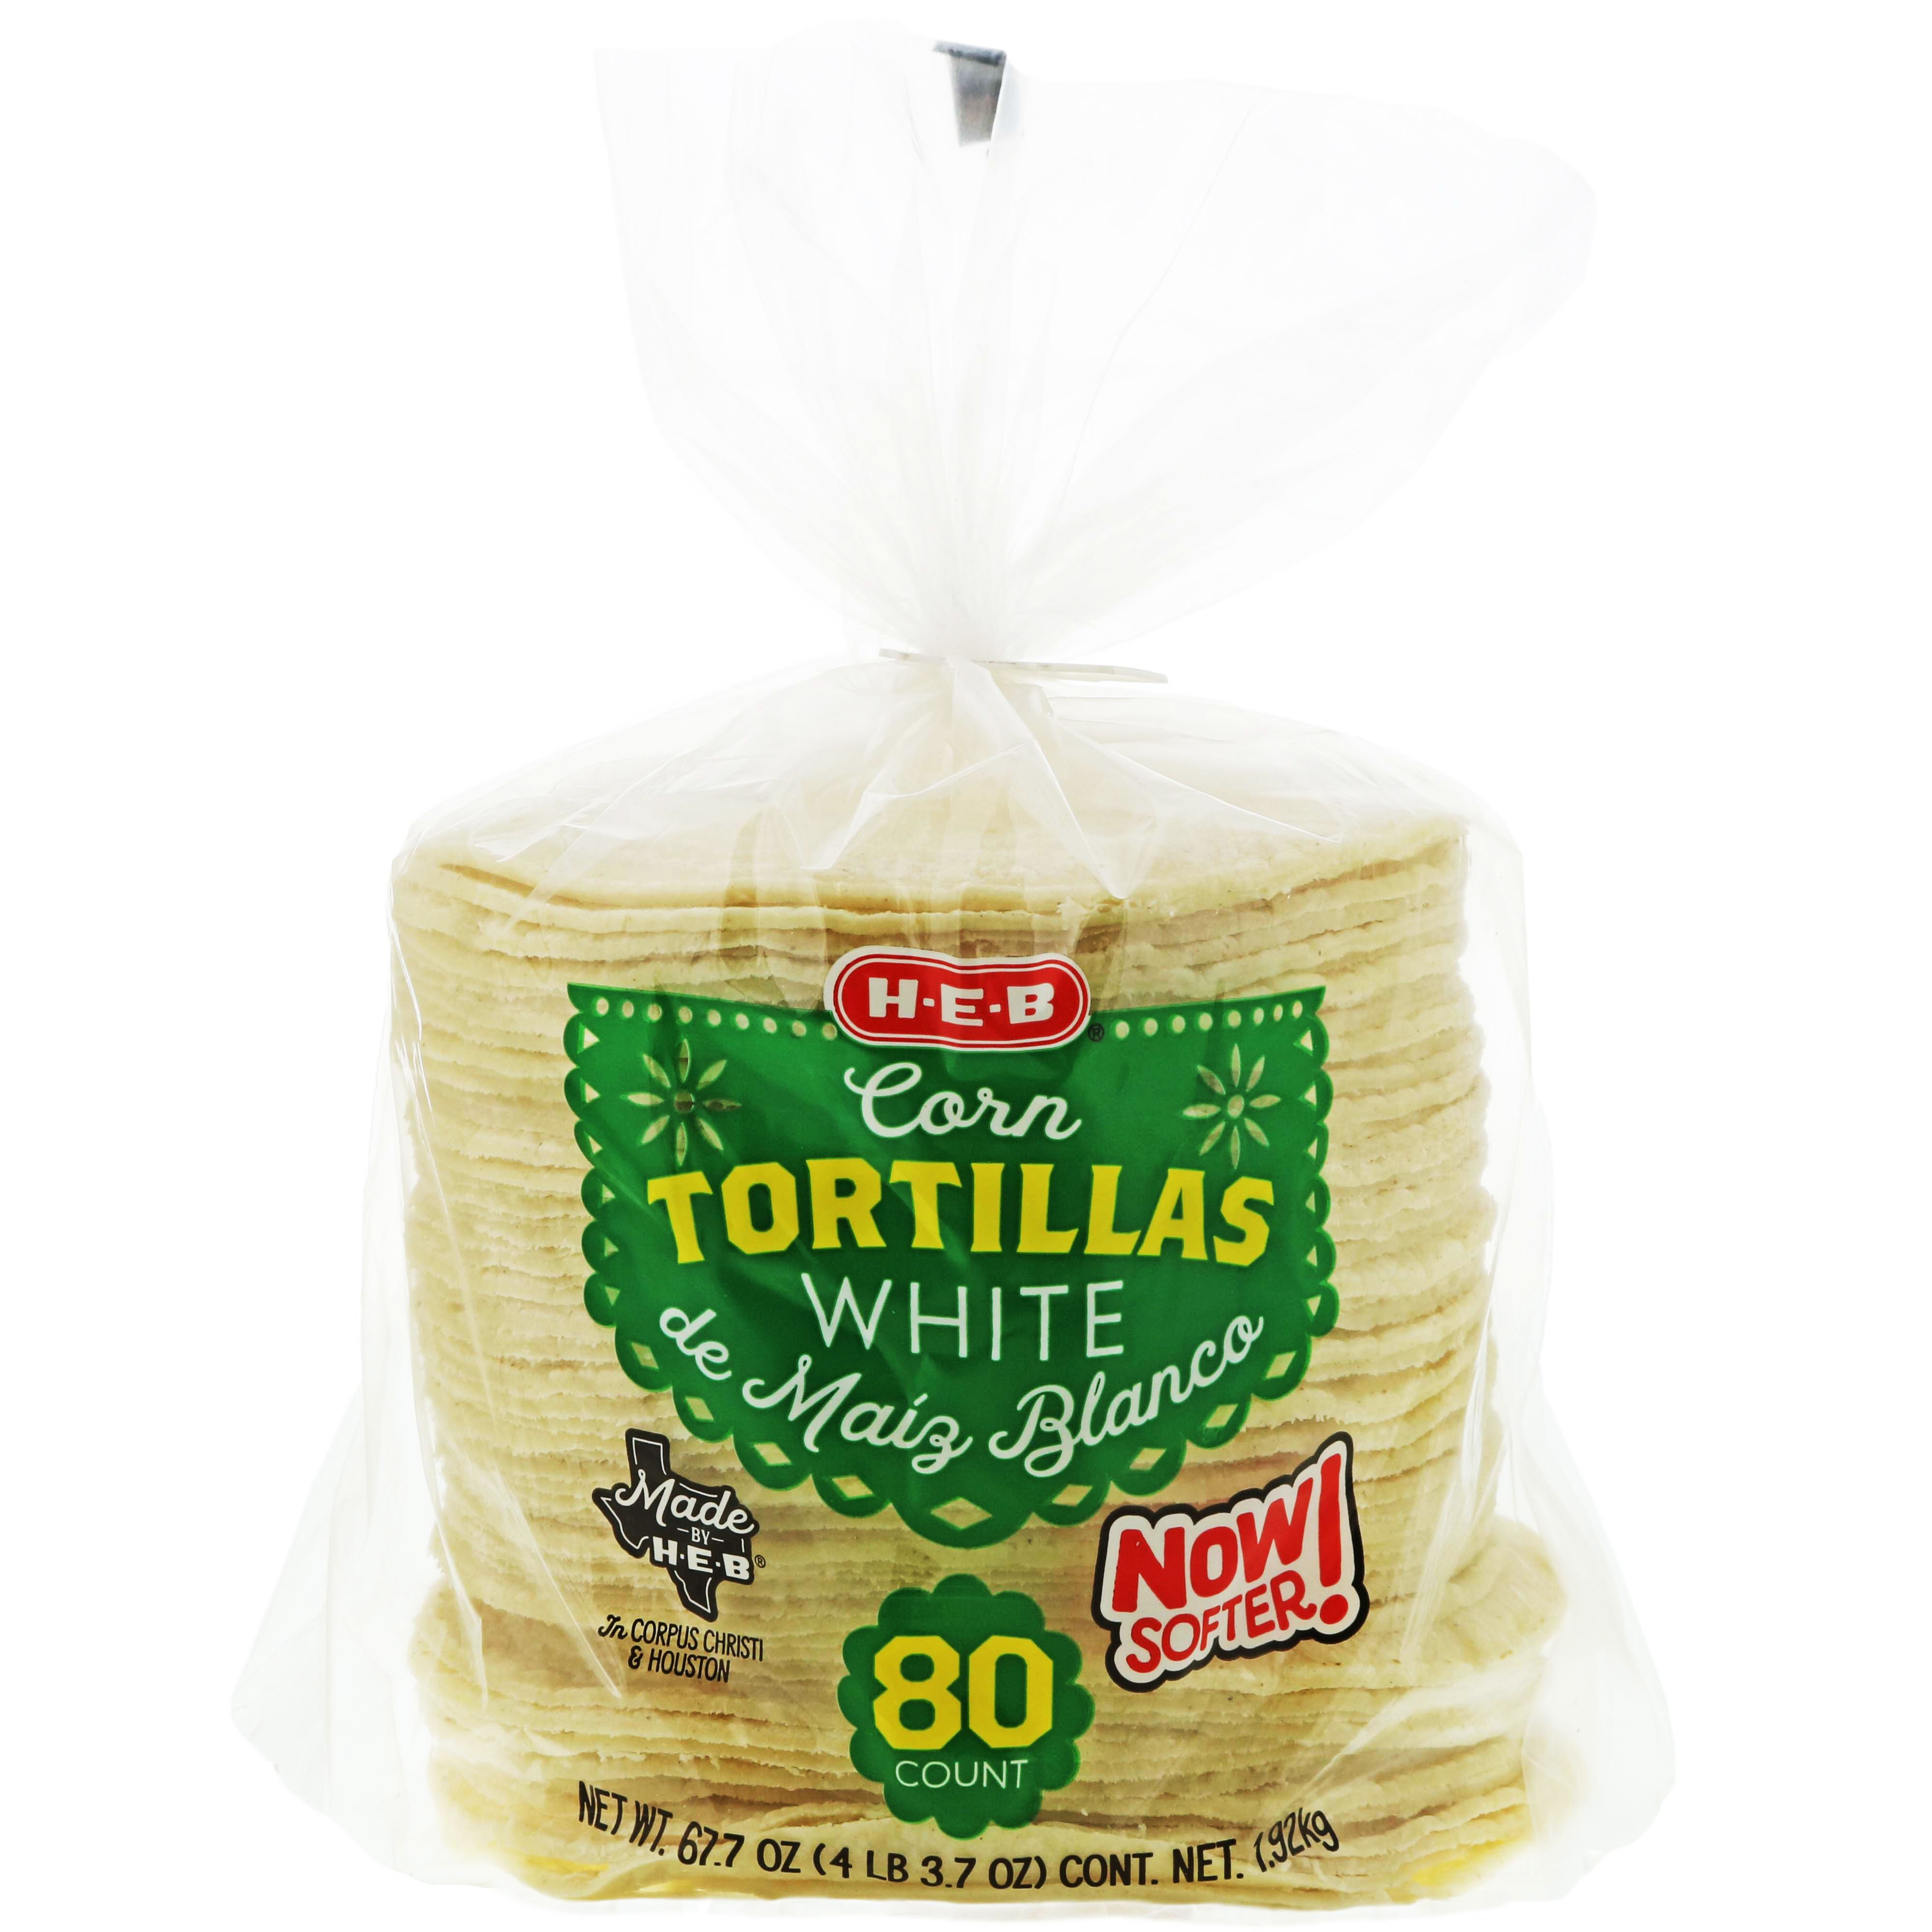 H E B White Corn Tortillas Shop Tortillas At H E B